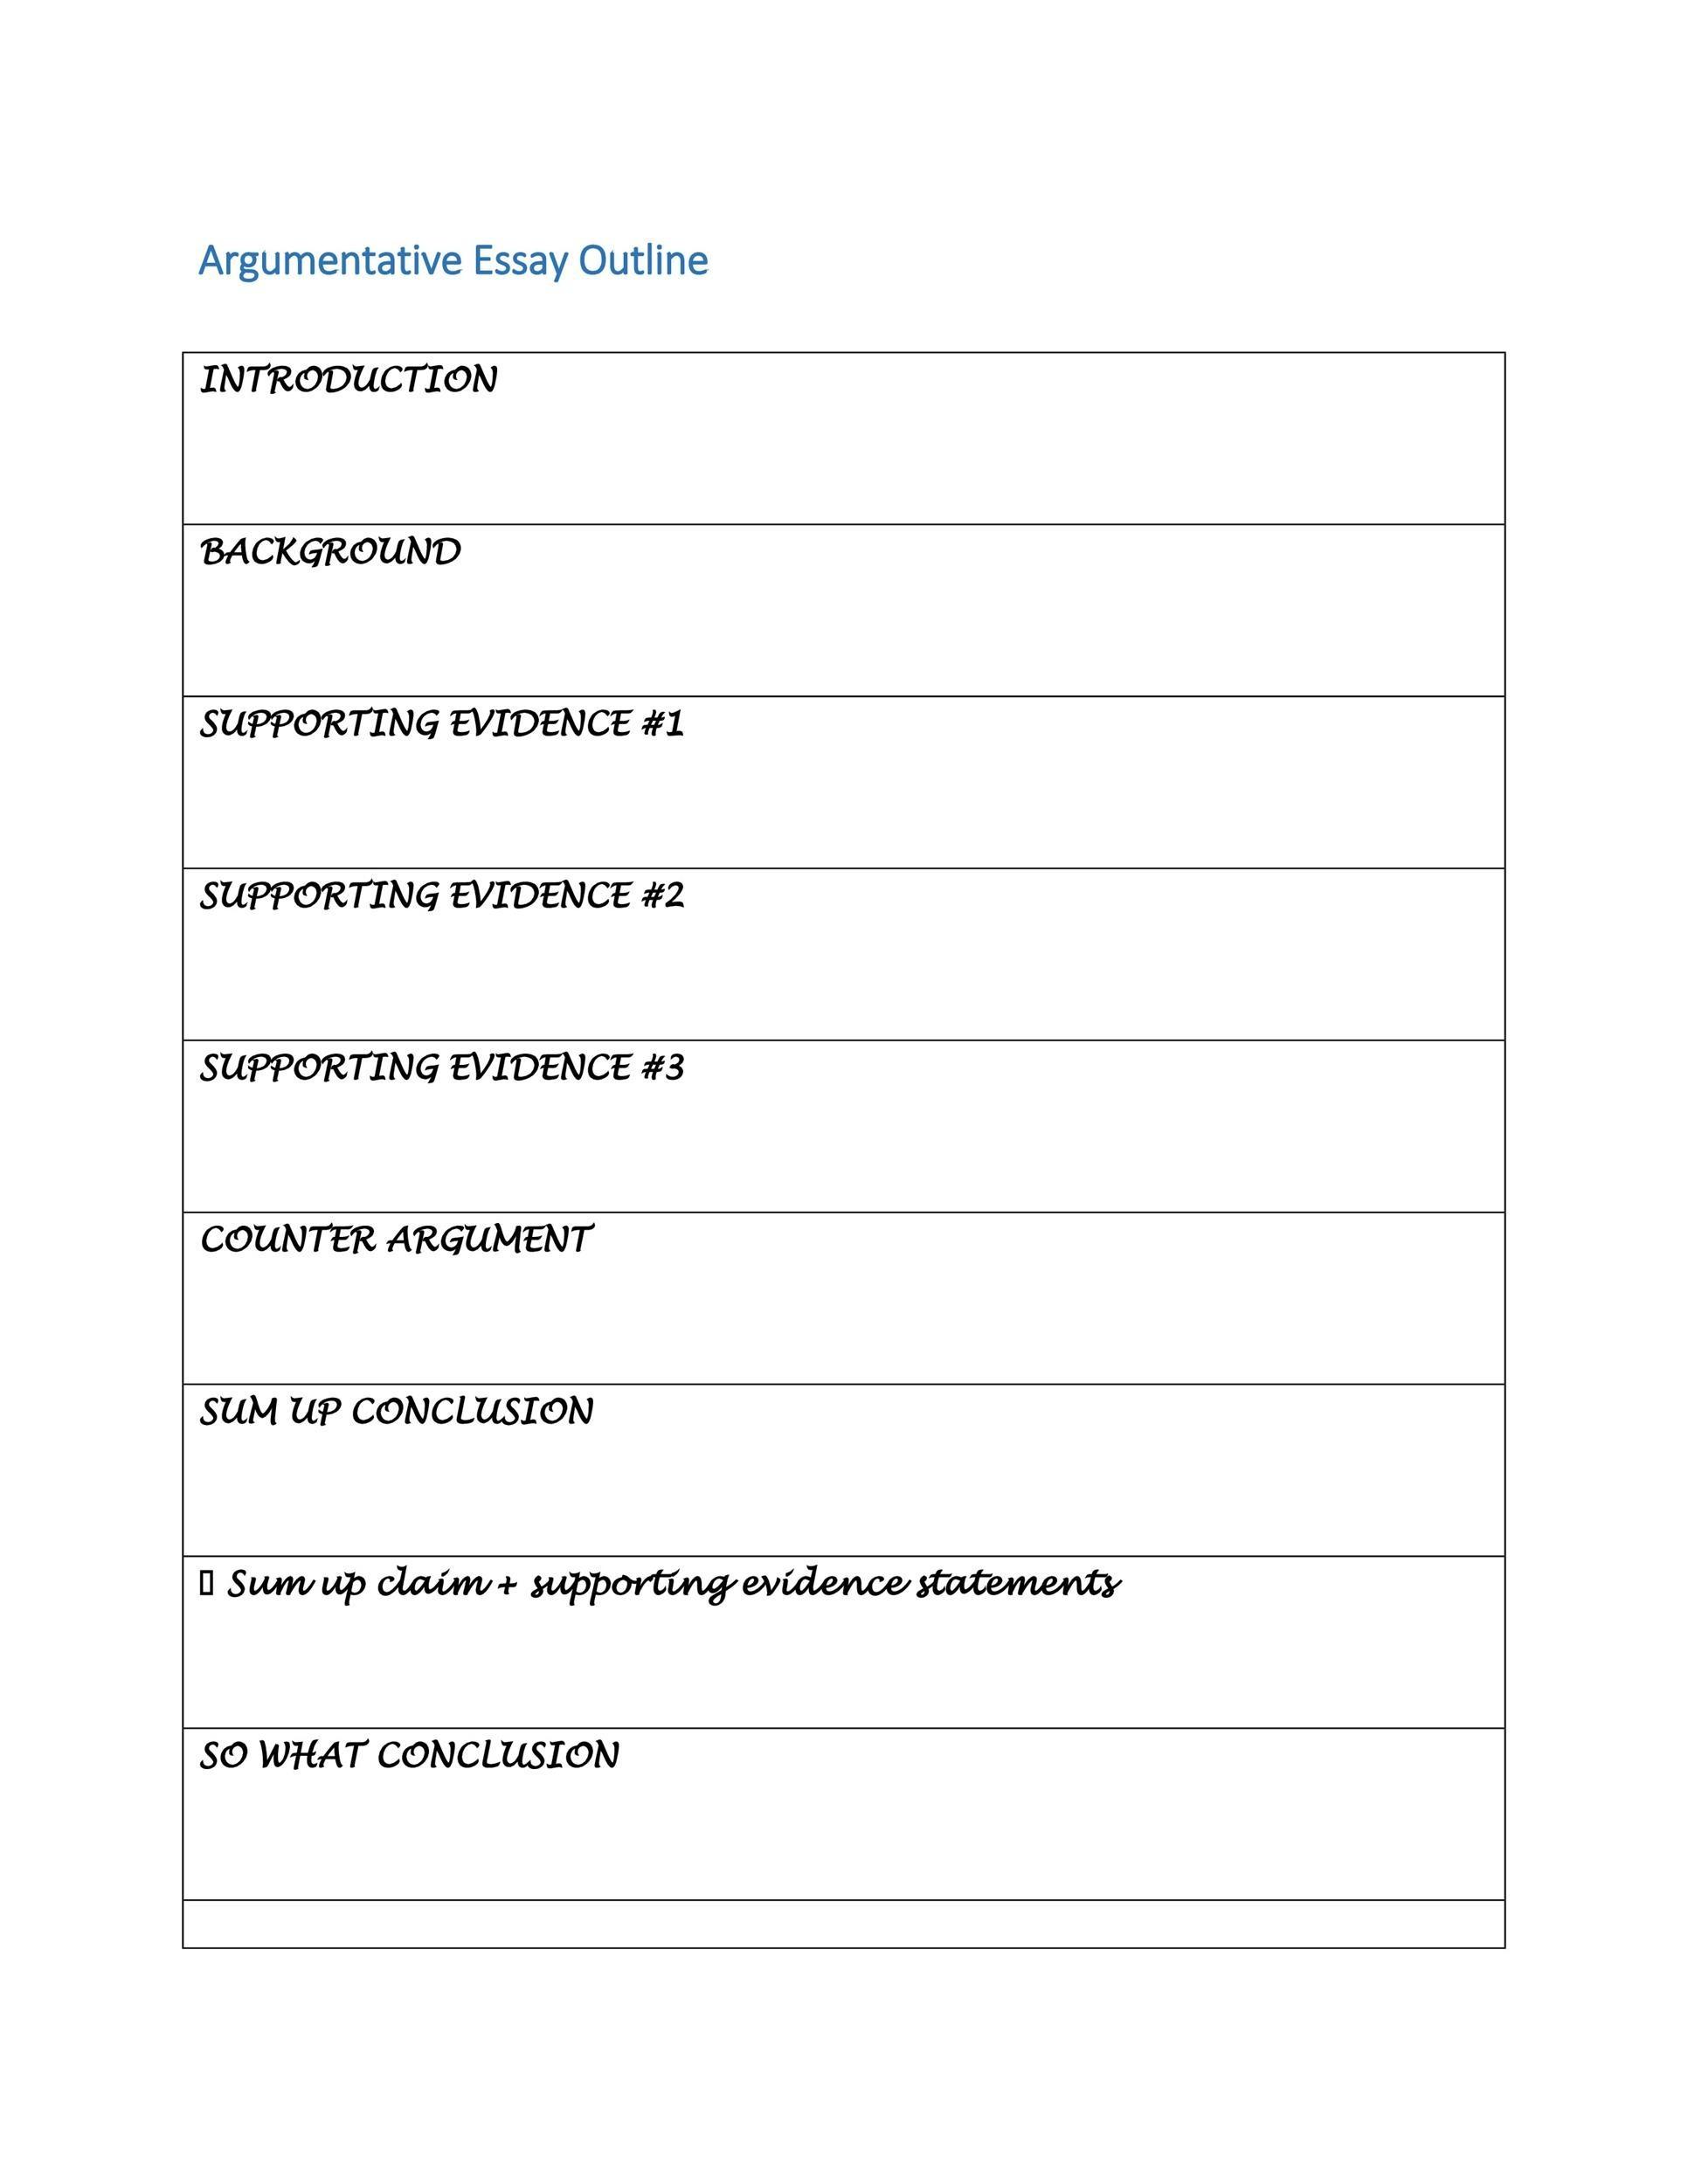 37 Outstanding Essay Outline Templates (Argumentative, Narrative